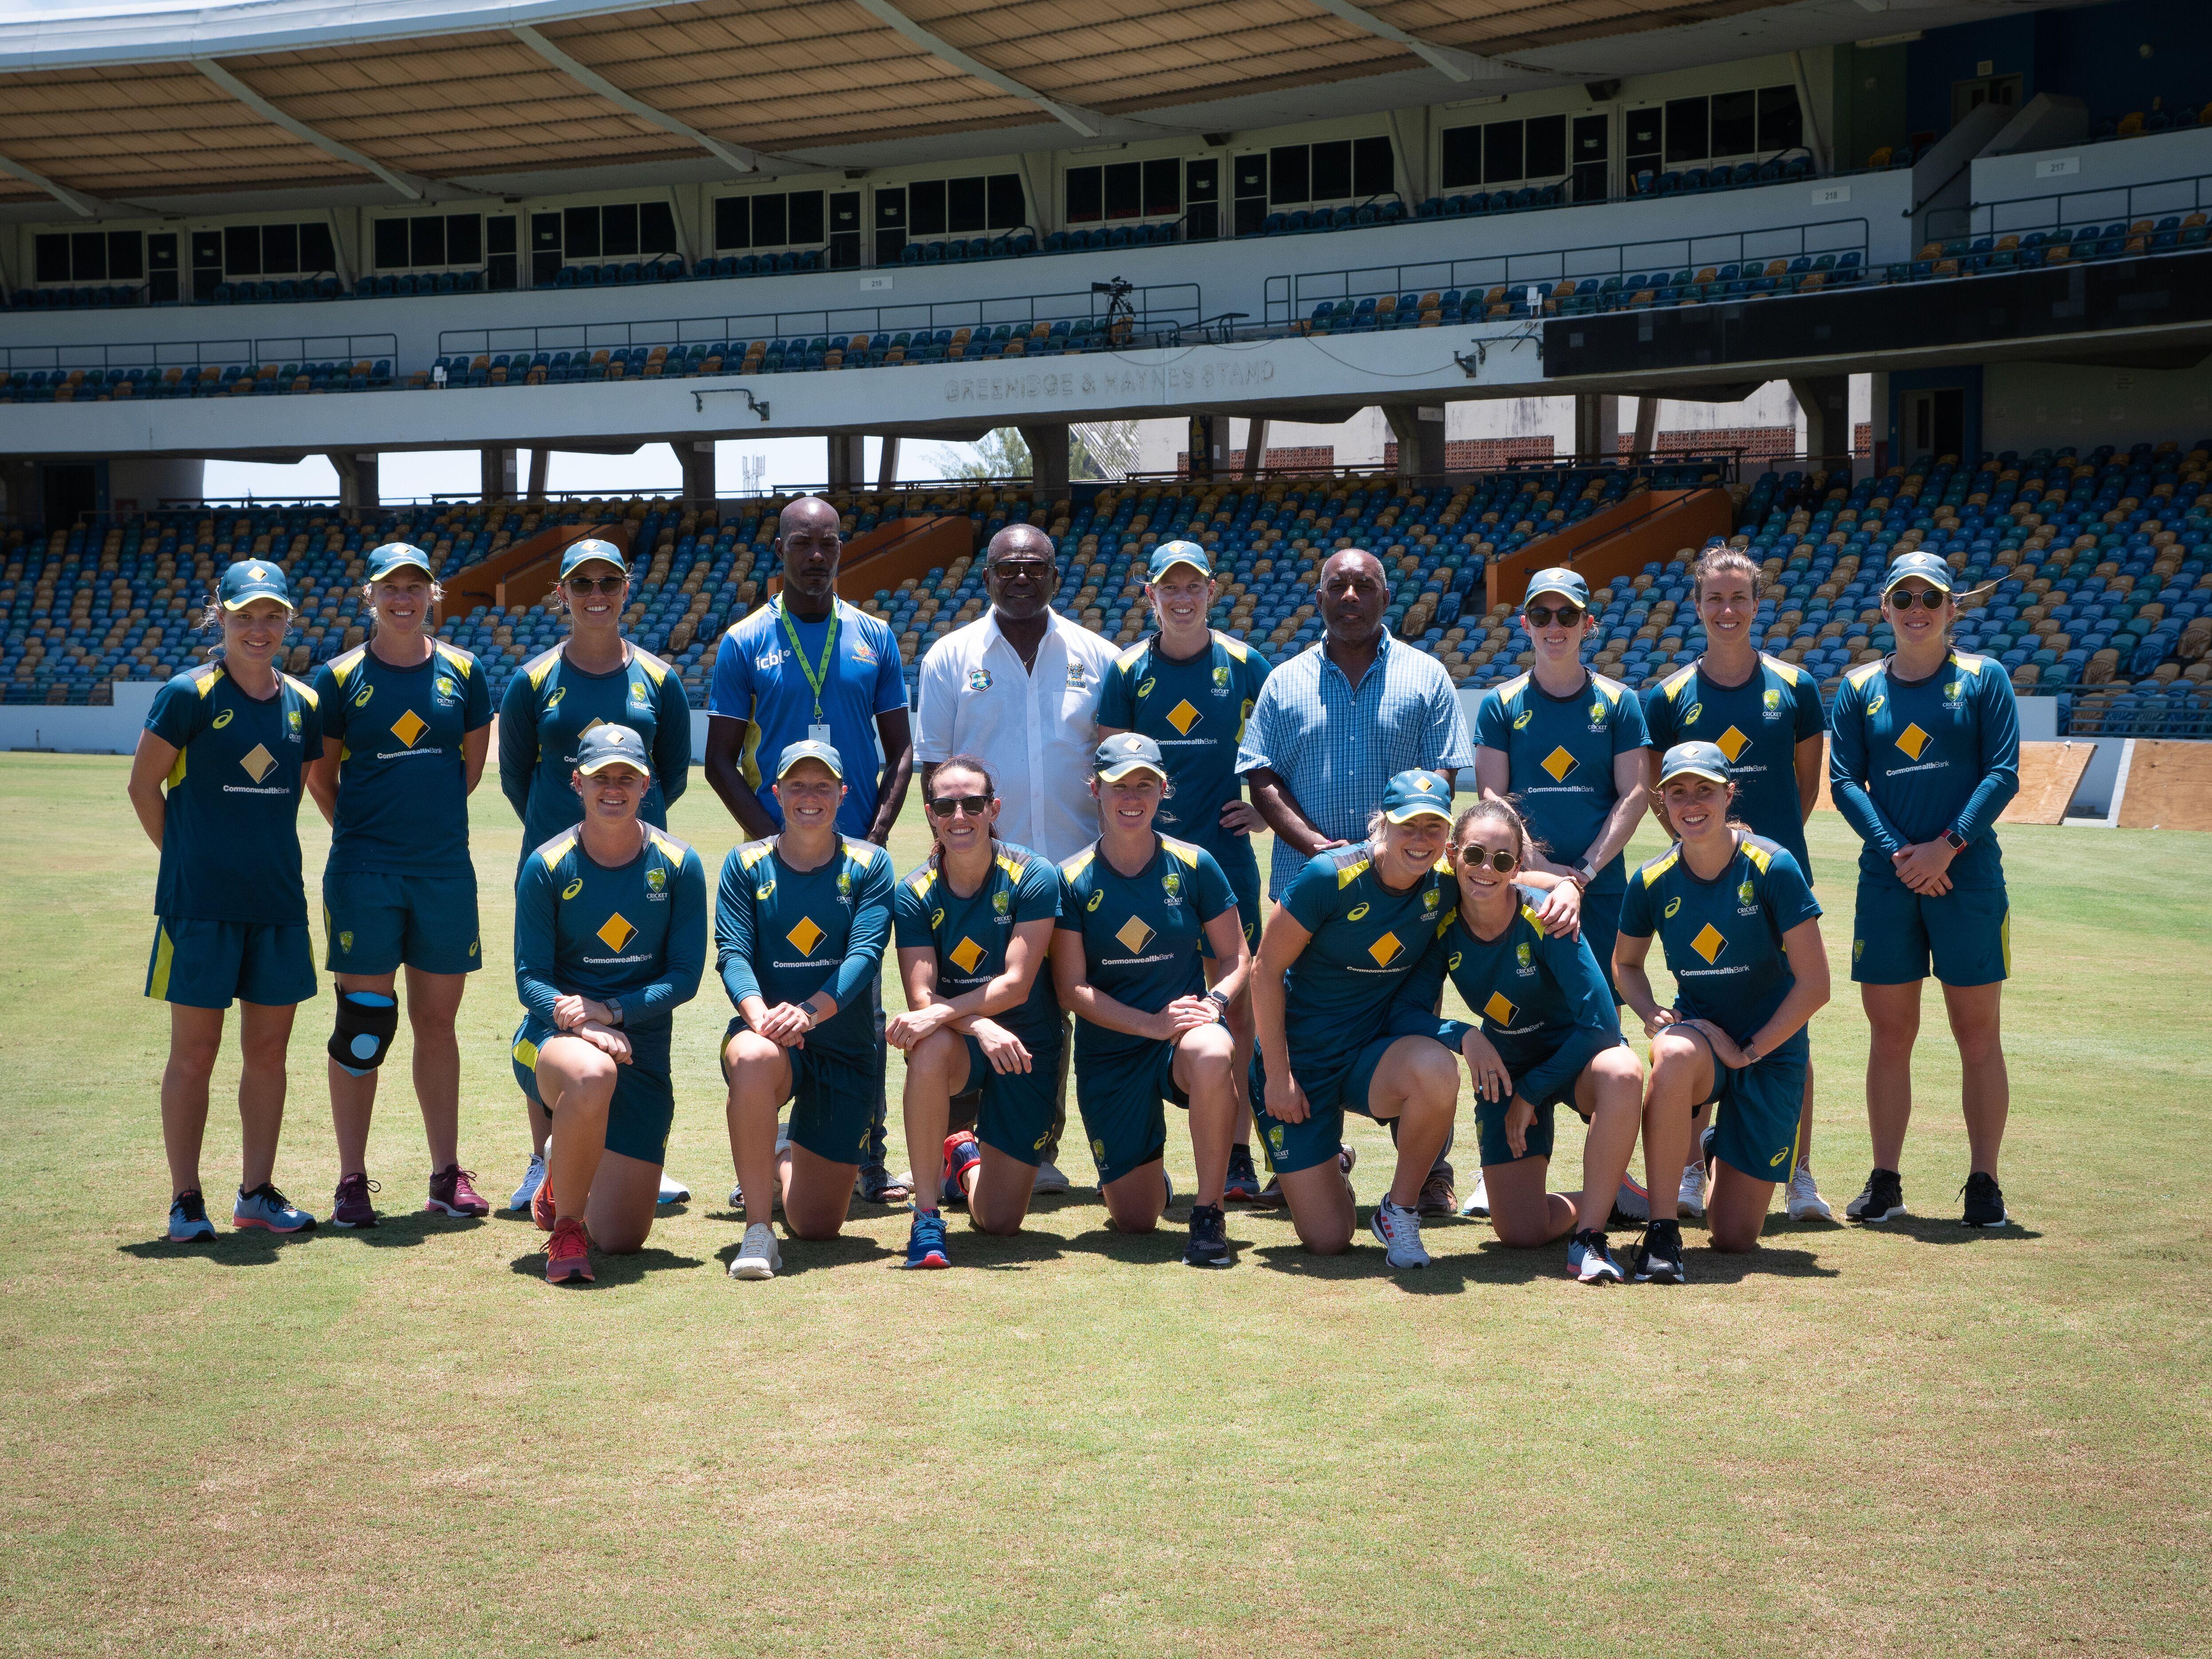 The 2019 Aussie women assemble // Cricket Network